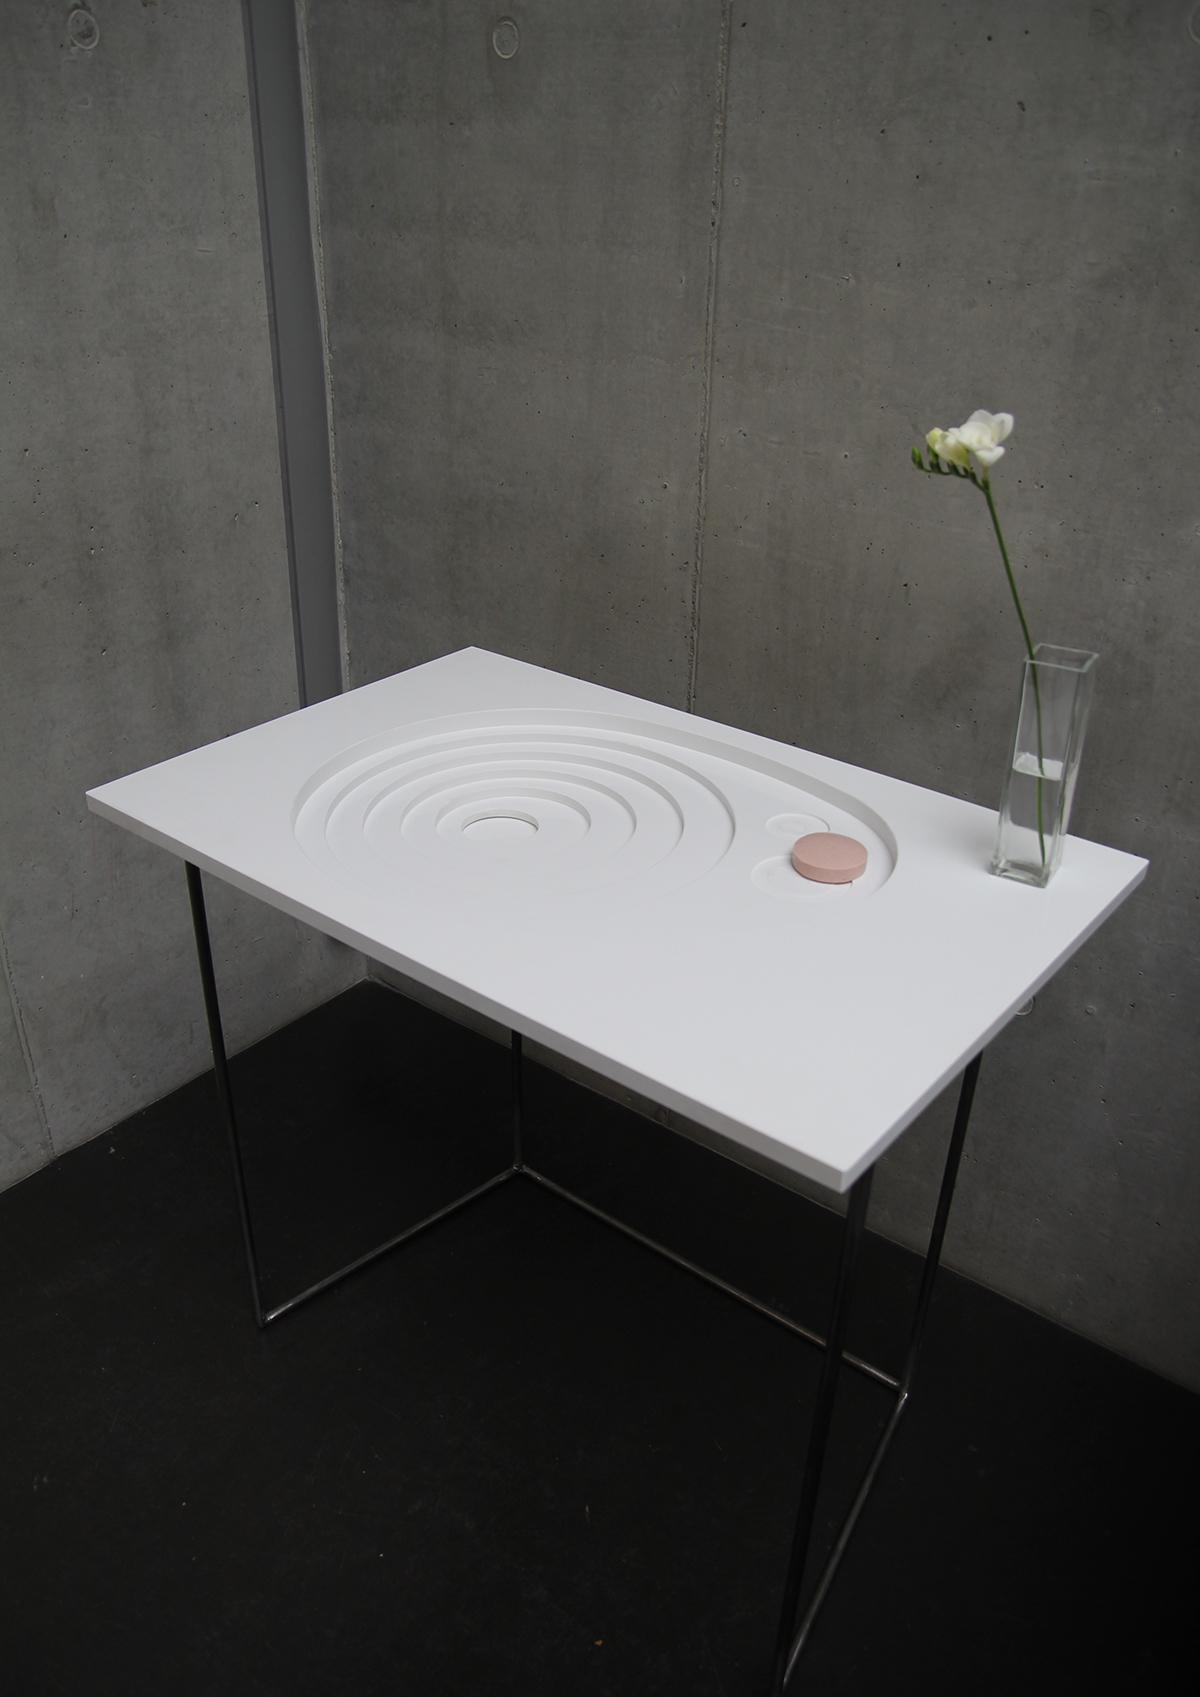 Basin washbasin bathroom product design  artificial stone Interior